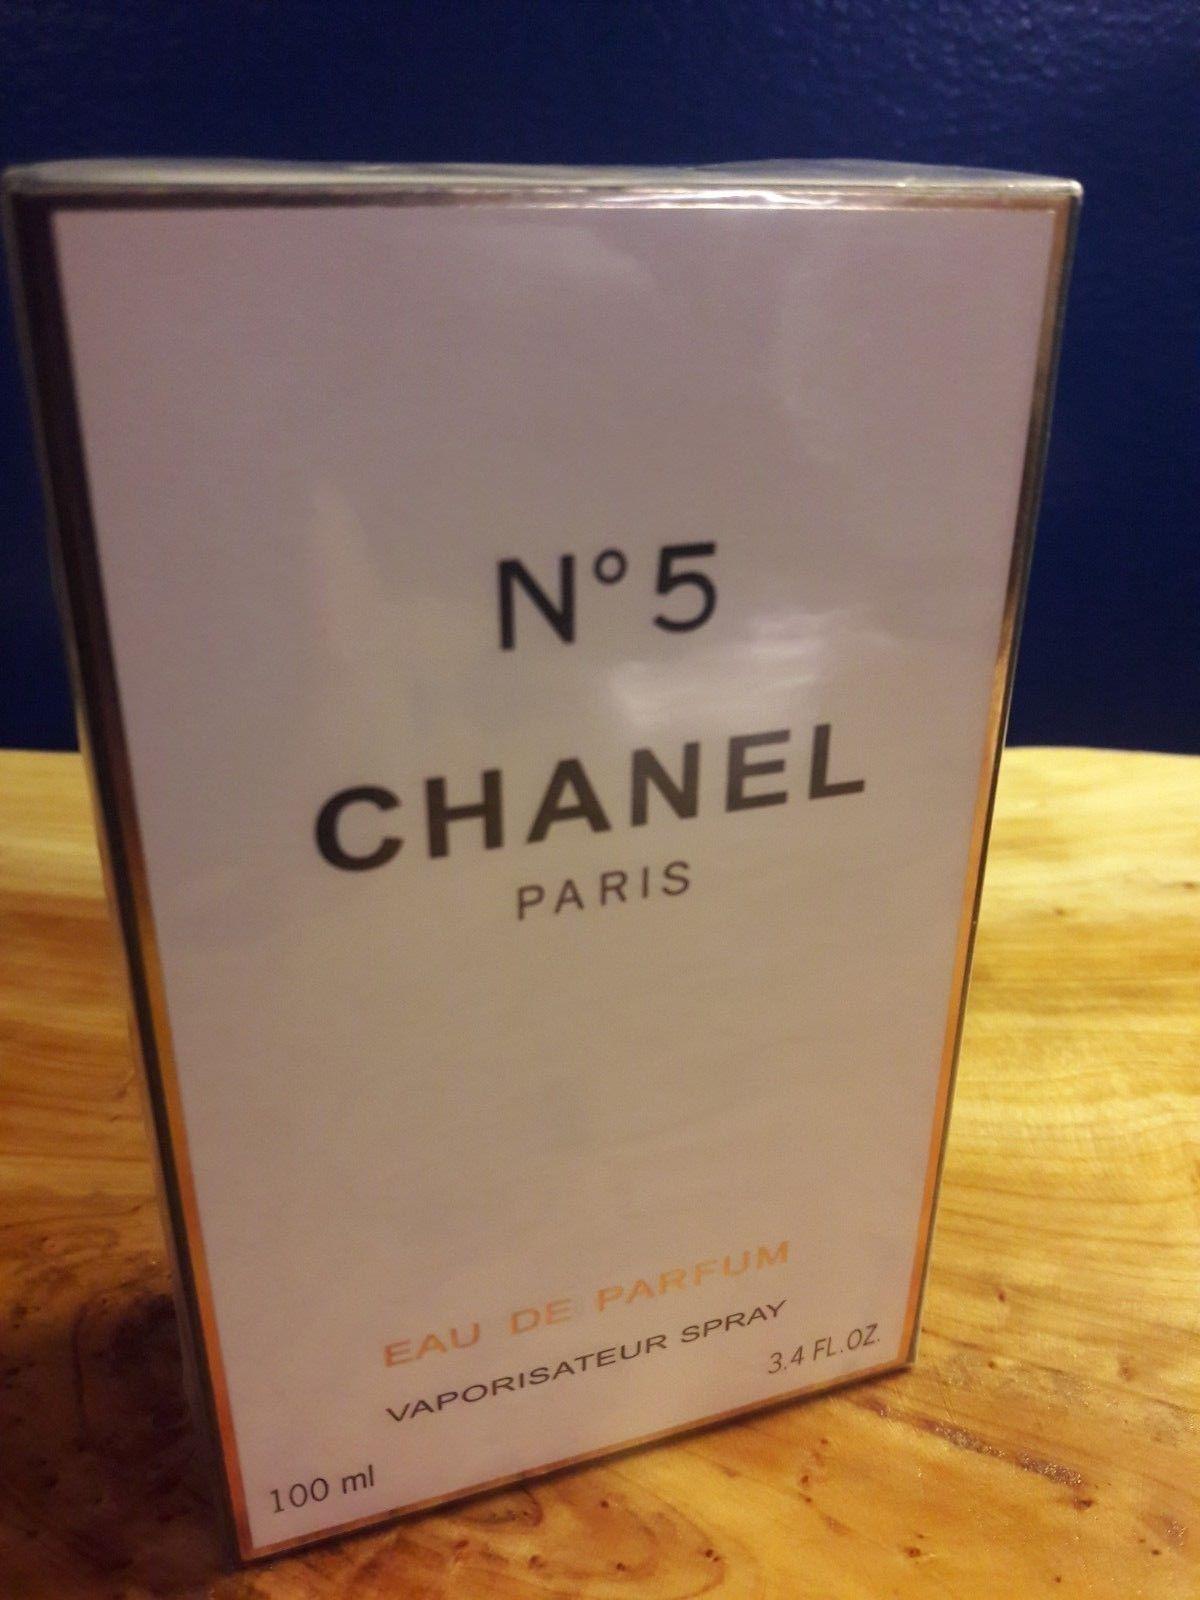 b898ce23 N°5 Chanel Paris Spray EDP 3.4oz/100ml- OPEN and 41 similar items